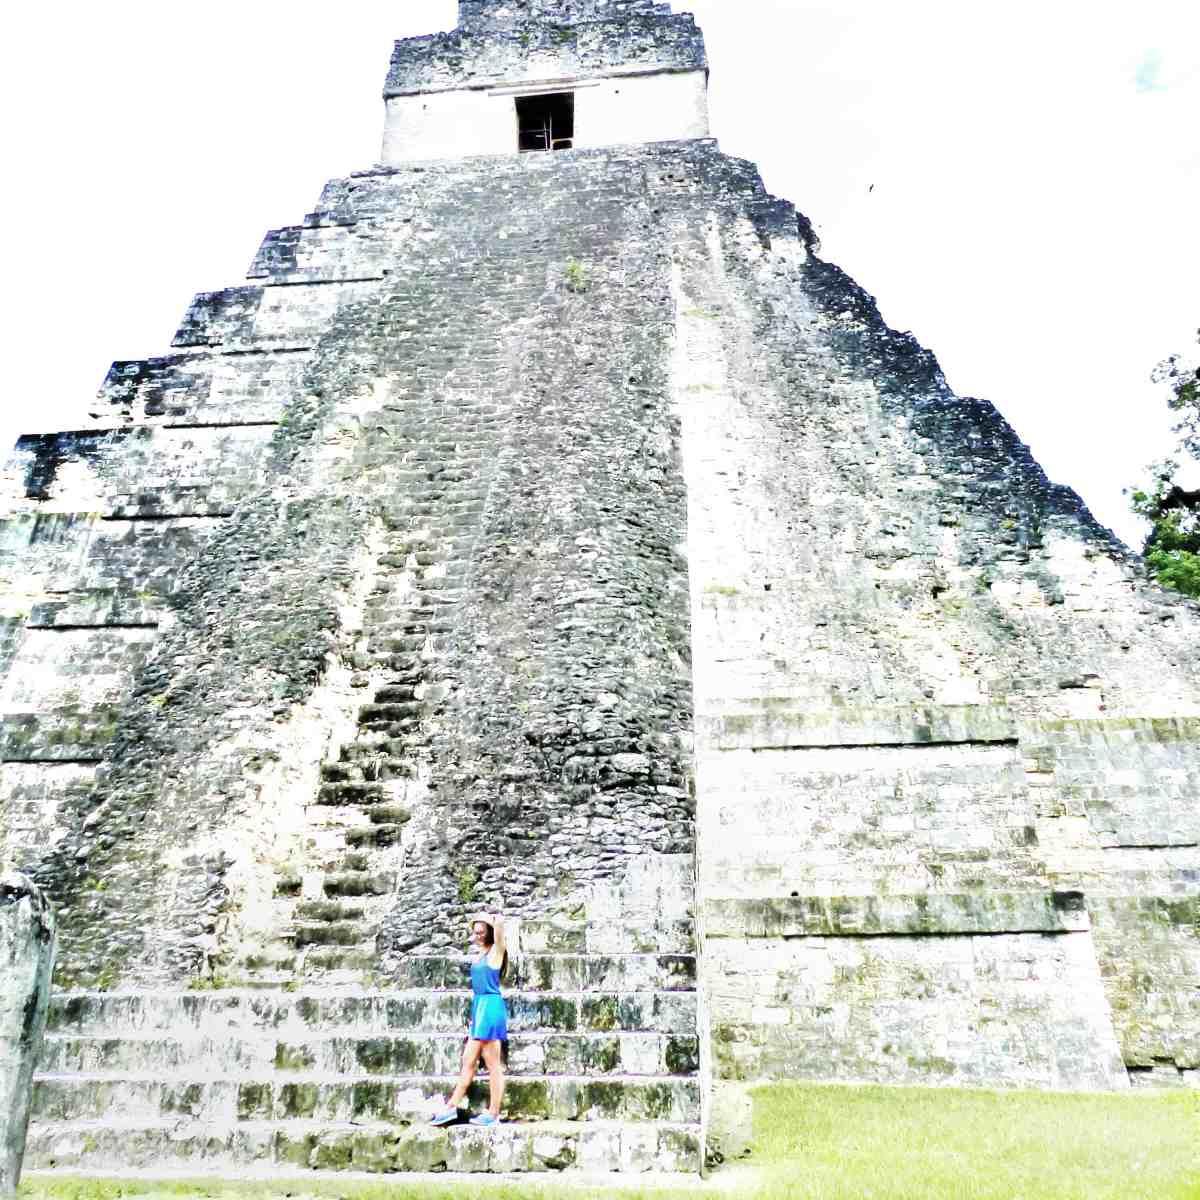 walking across the ruins of Tikal